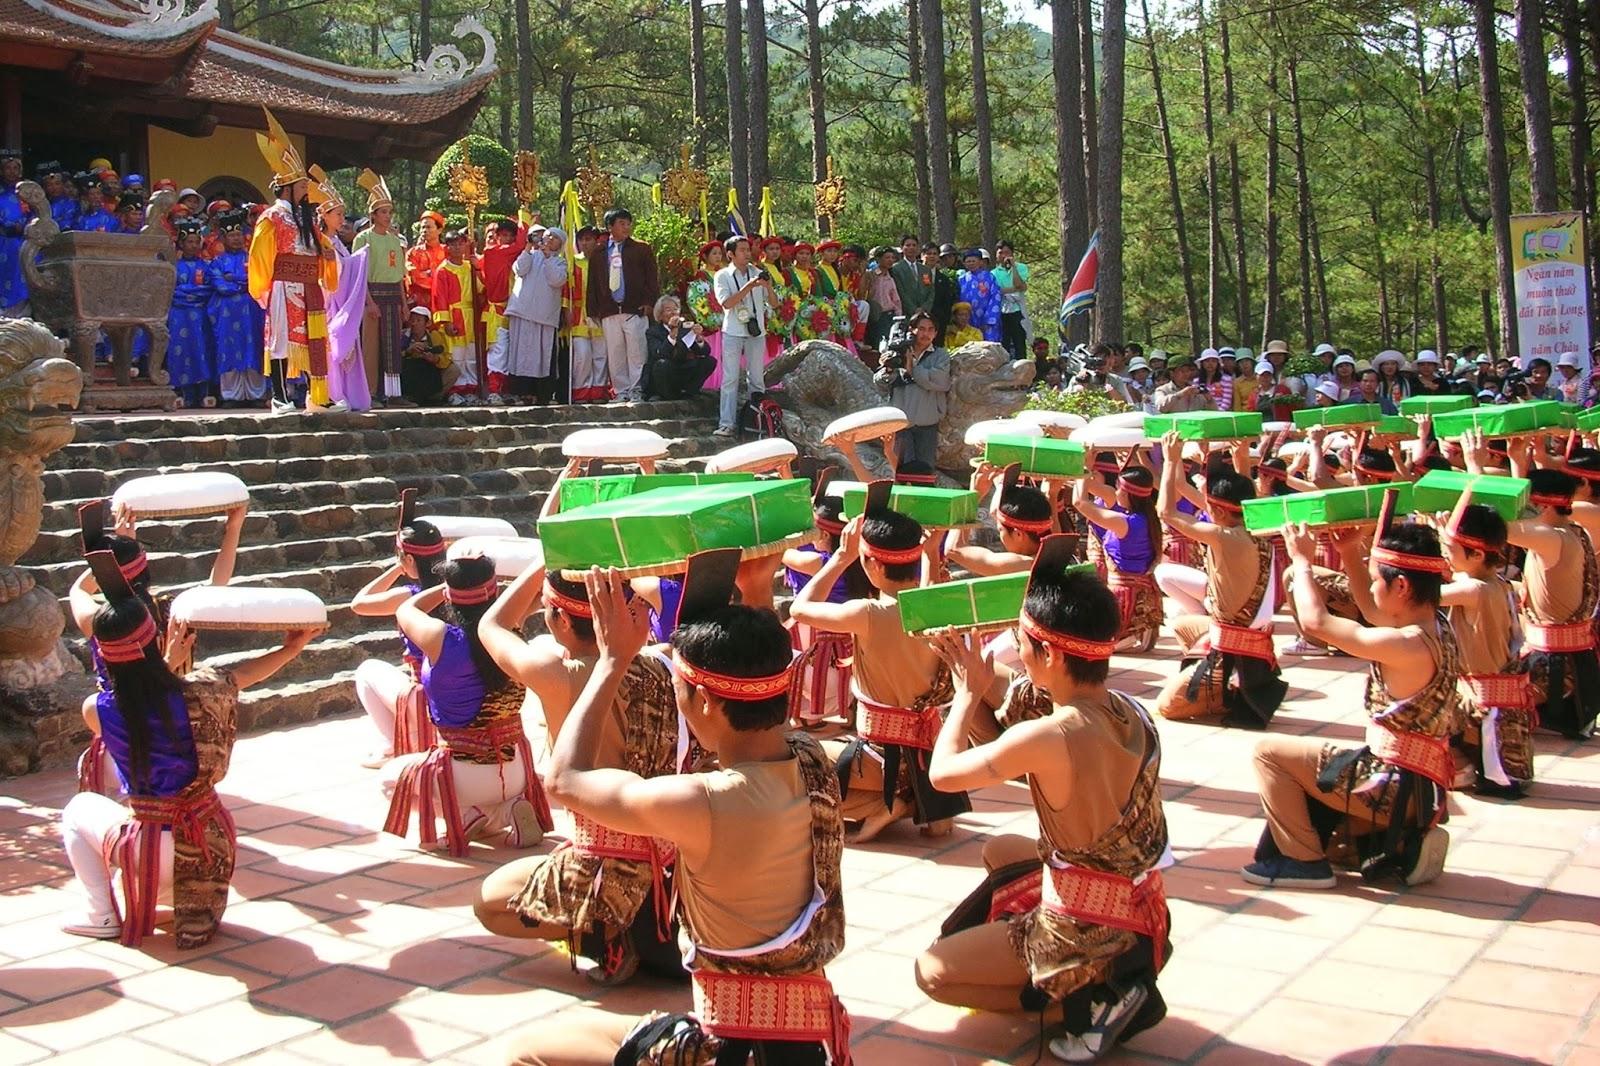 Hùng Kings' Festival – Vietnam